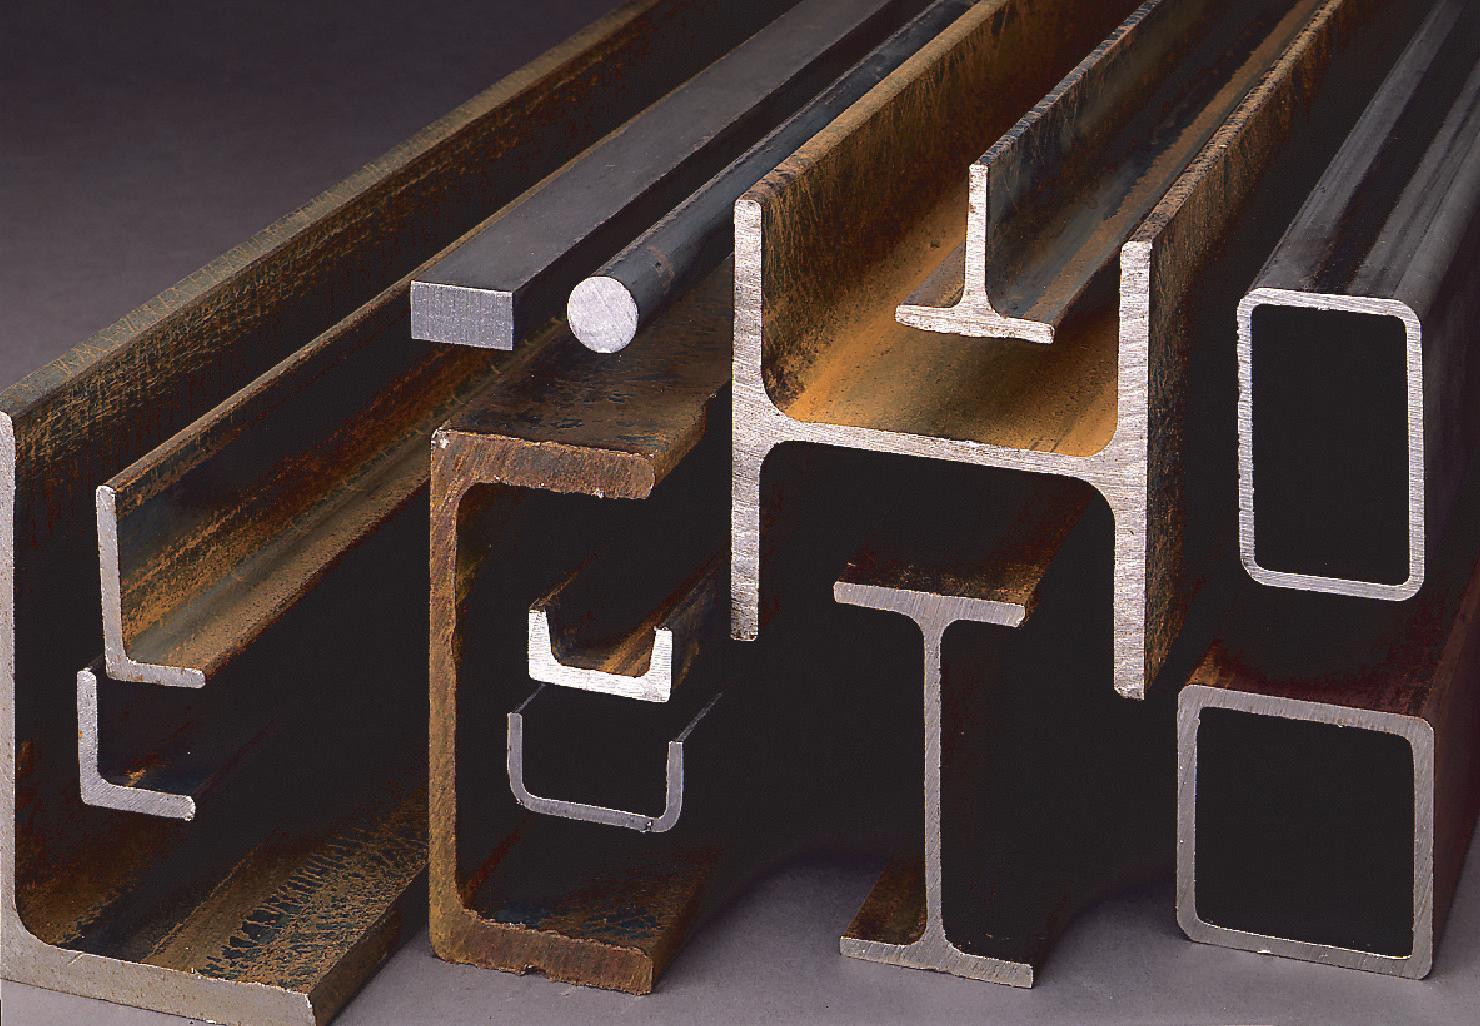 File:Konstruktionsstål.JPG - Wikimedia Commons